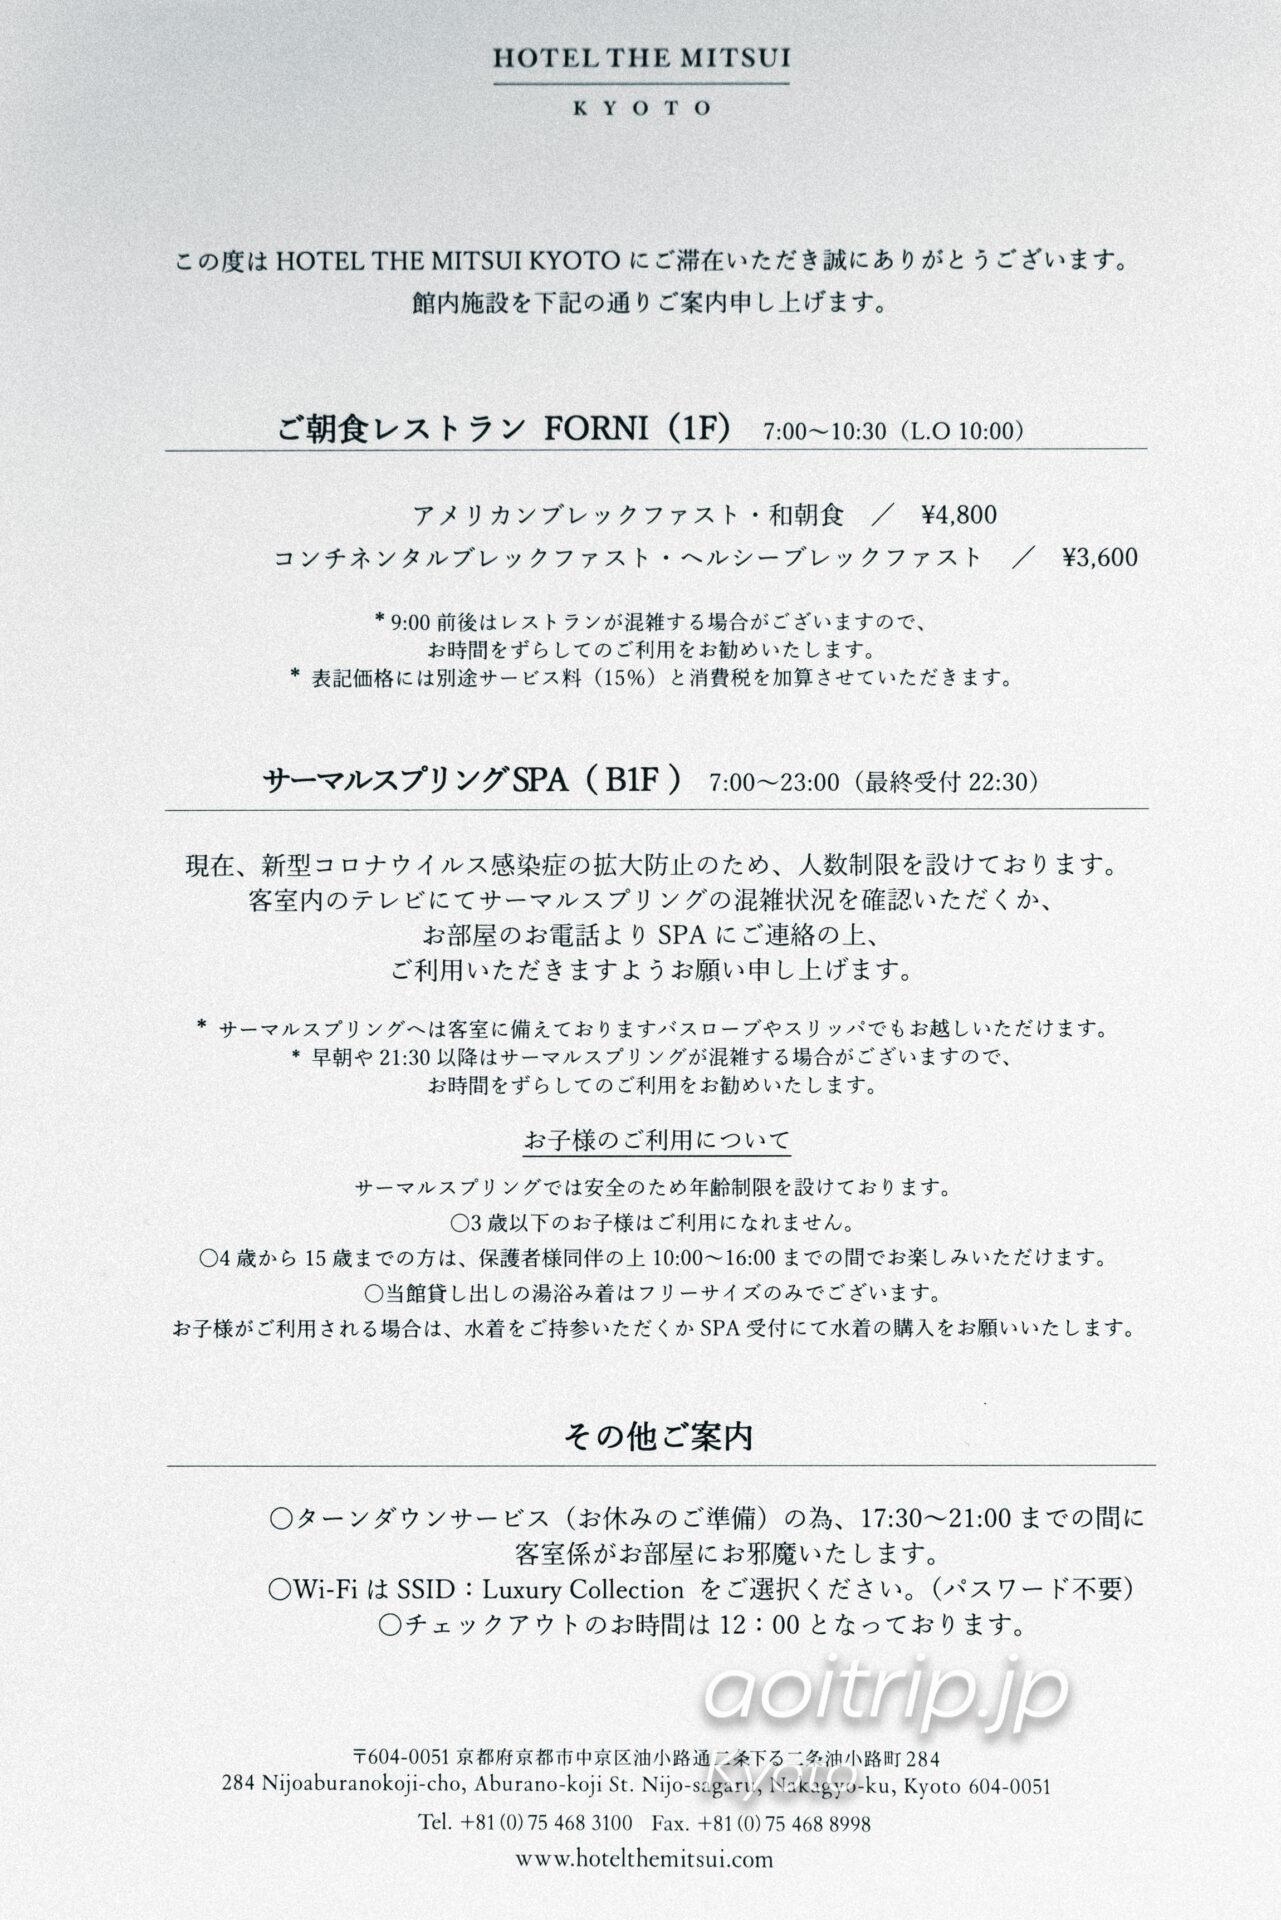 HOTEL THE MITSUI KYOTO 宿泊時のご案内